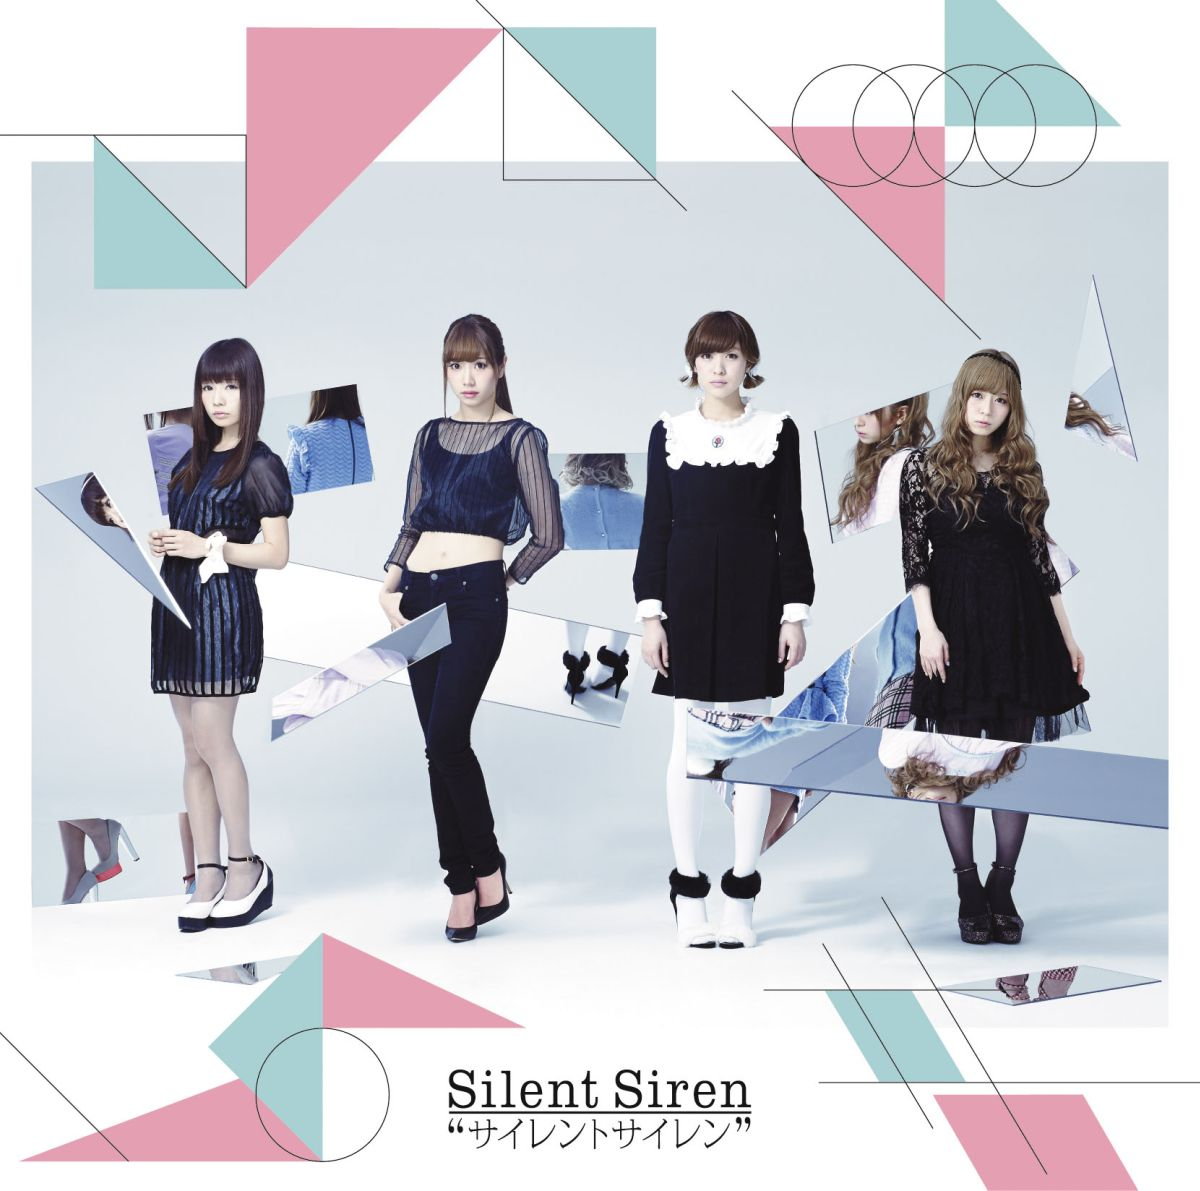 Silent Siren 3rd album